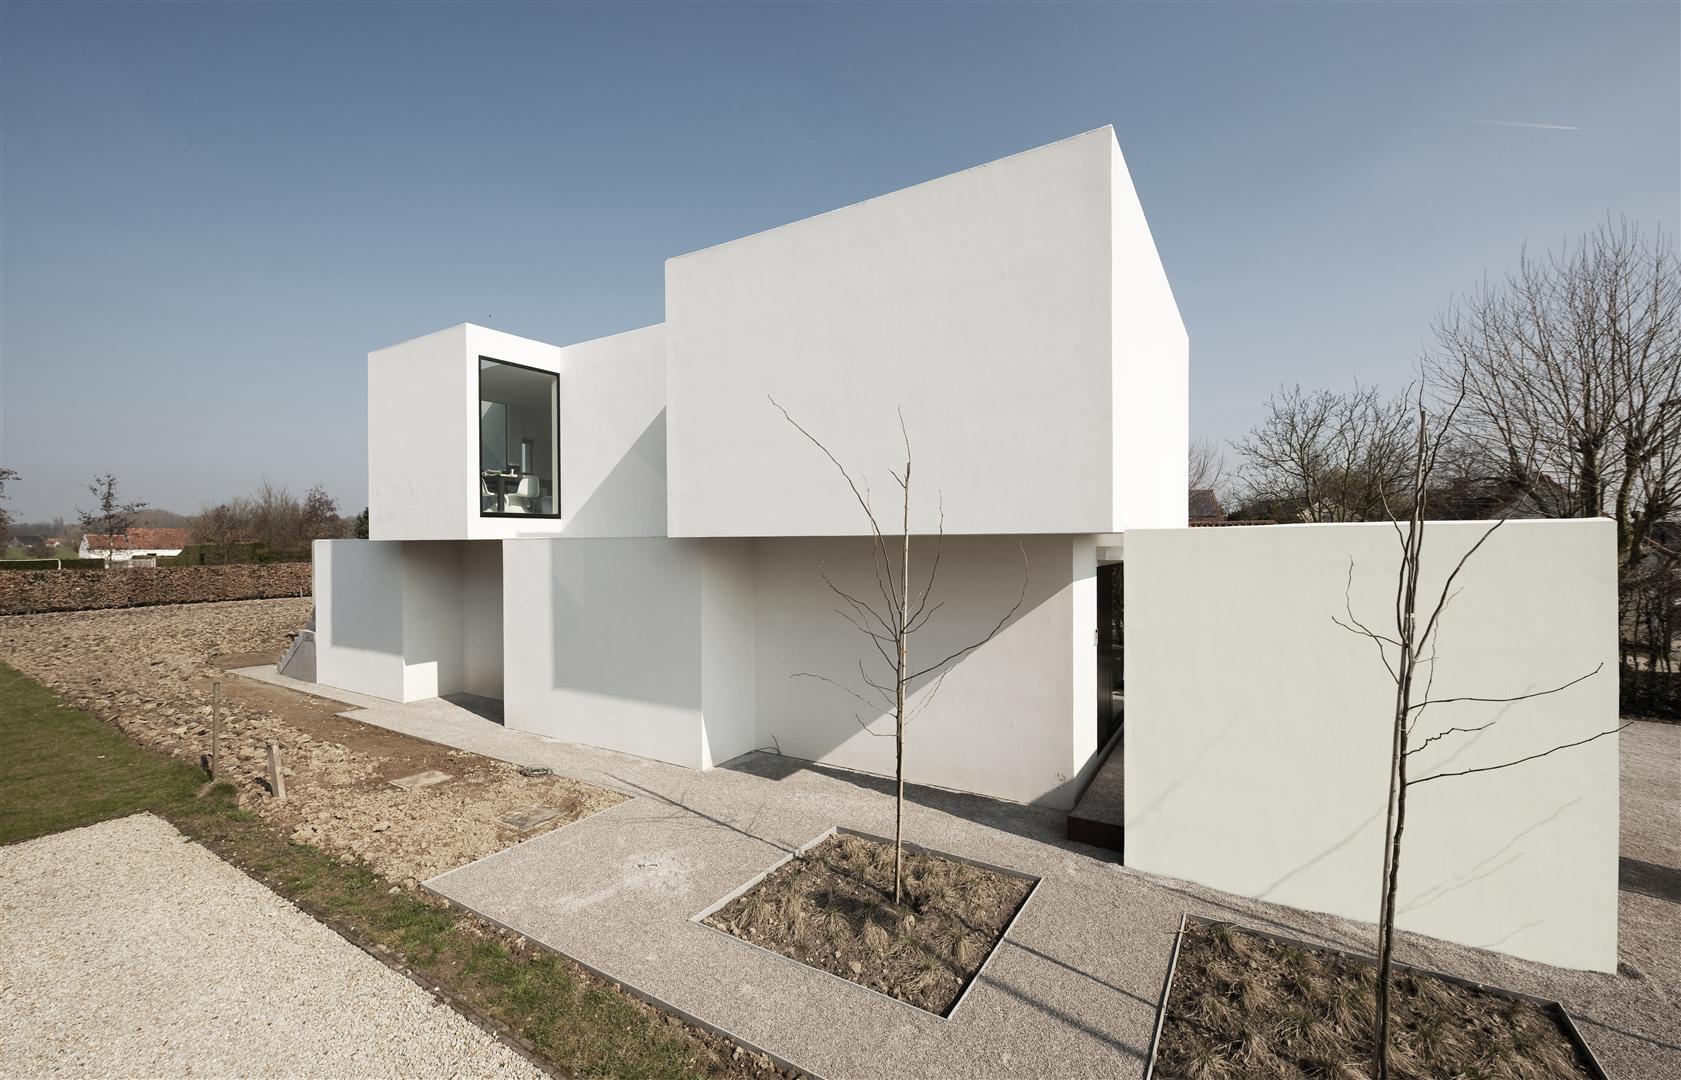 Casa D-Z / GRAUX & BAEYENS Architecten, © Luc Roymans